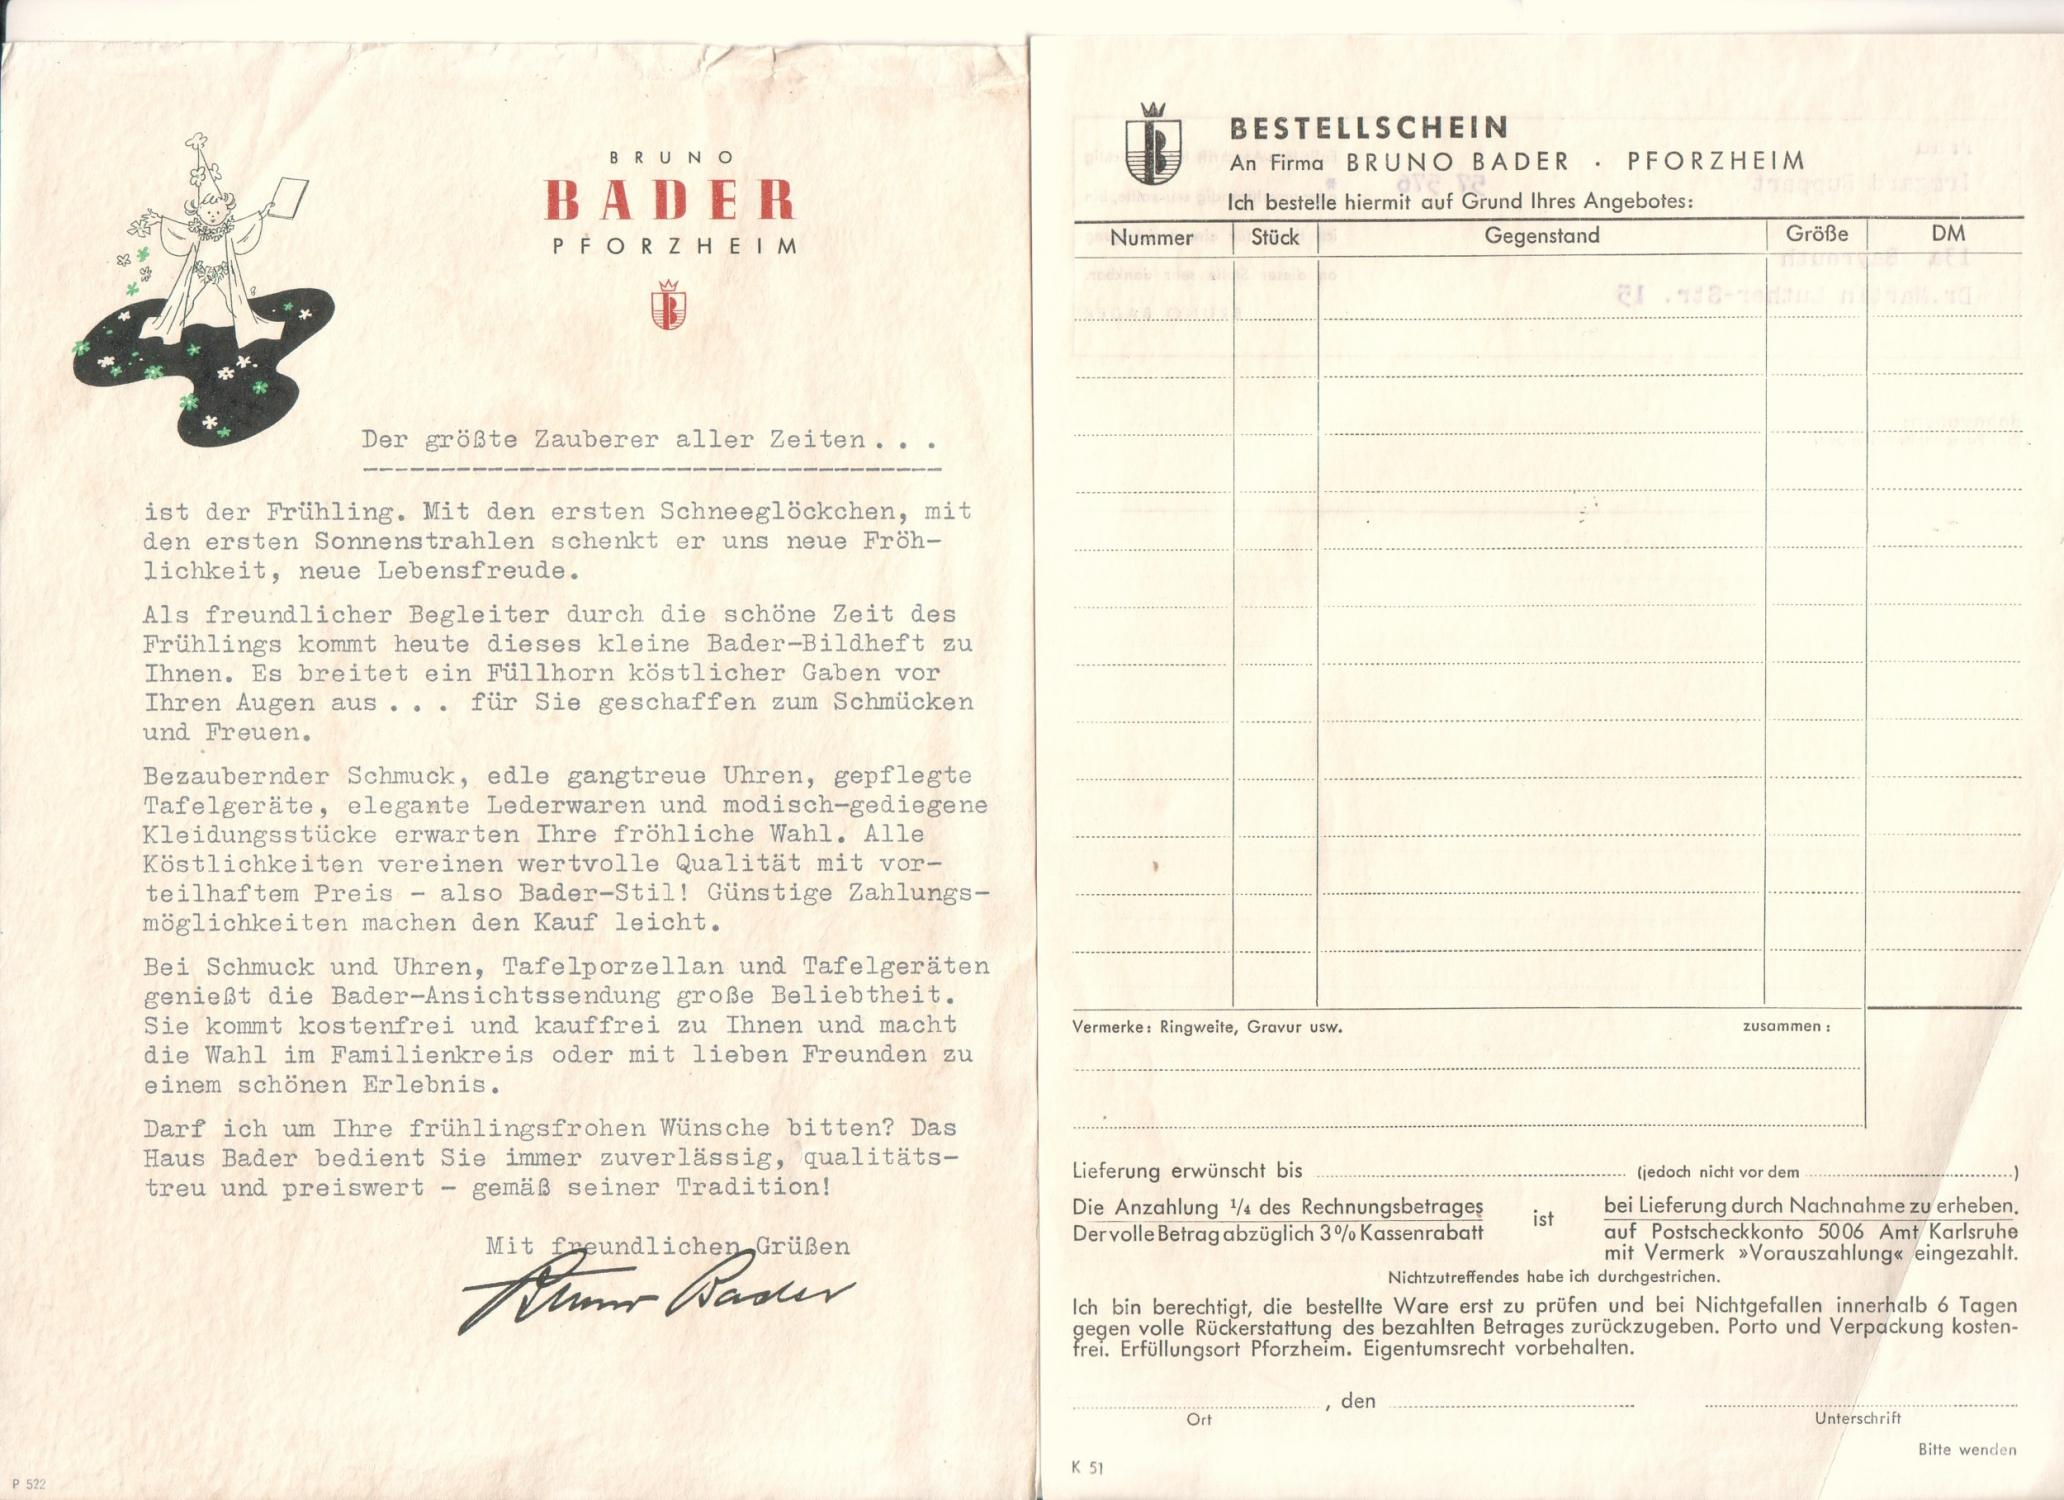 9e73d29d5a Konvolut der Firma Bruno Bader aus Pforzheim.: Bruno Bader Pforzheim